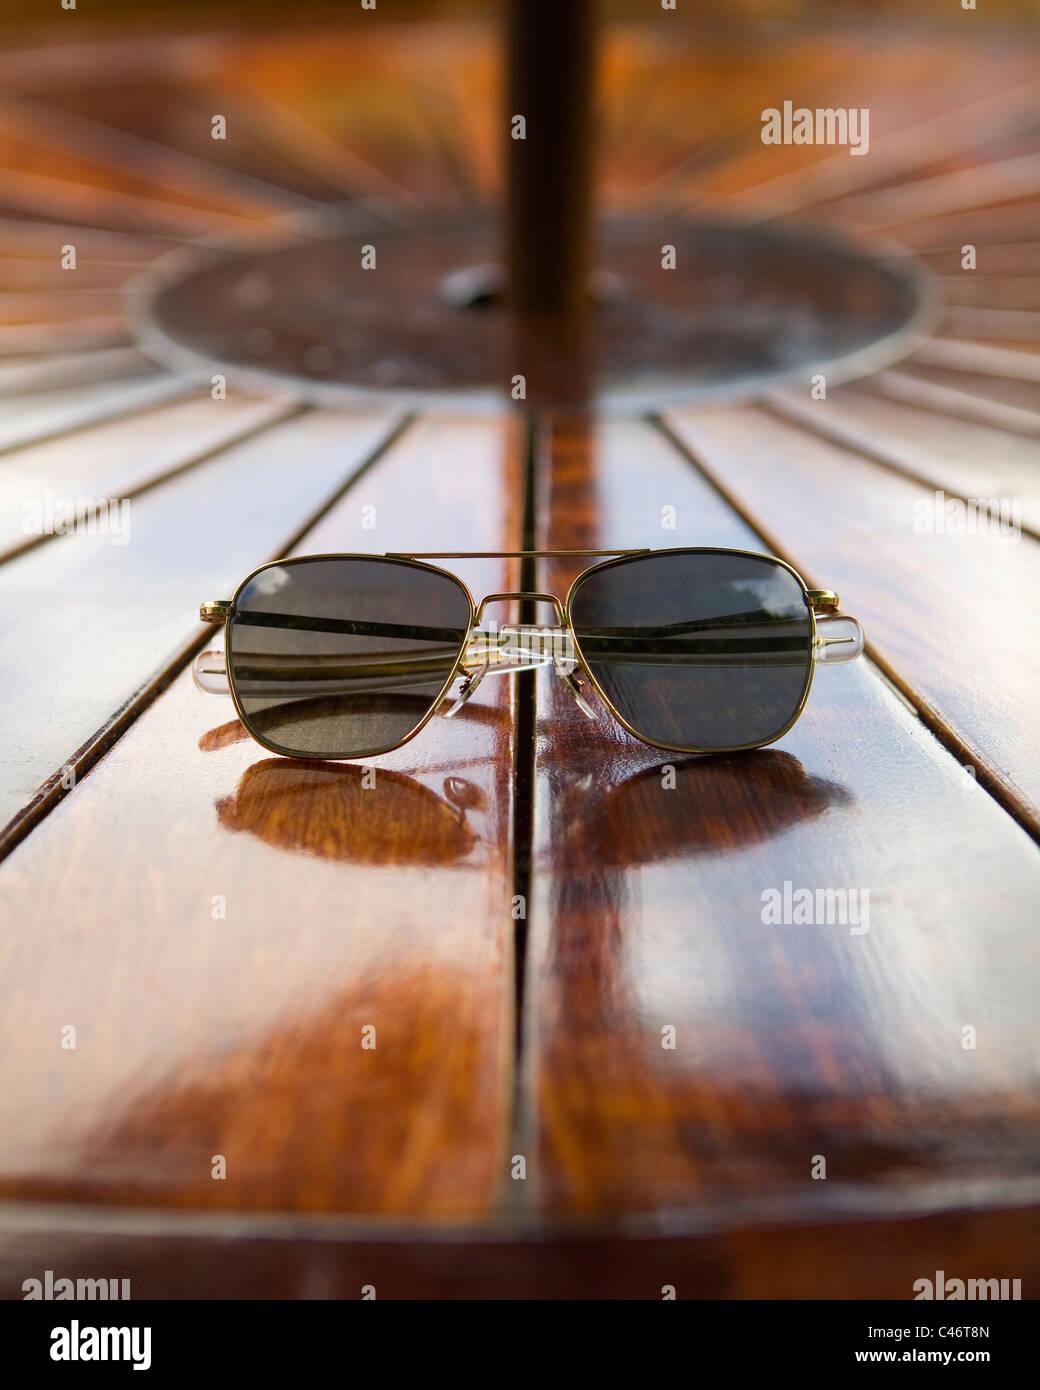 Un par de gafas de sol aviador sentarse en una mesa de madera Imagen De Stock